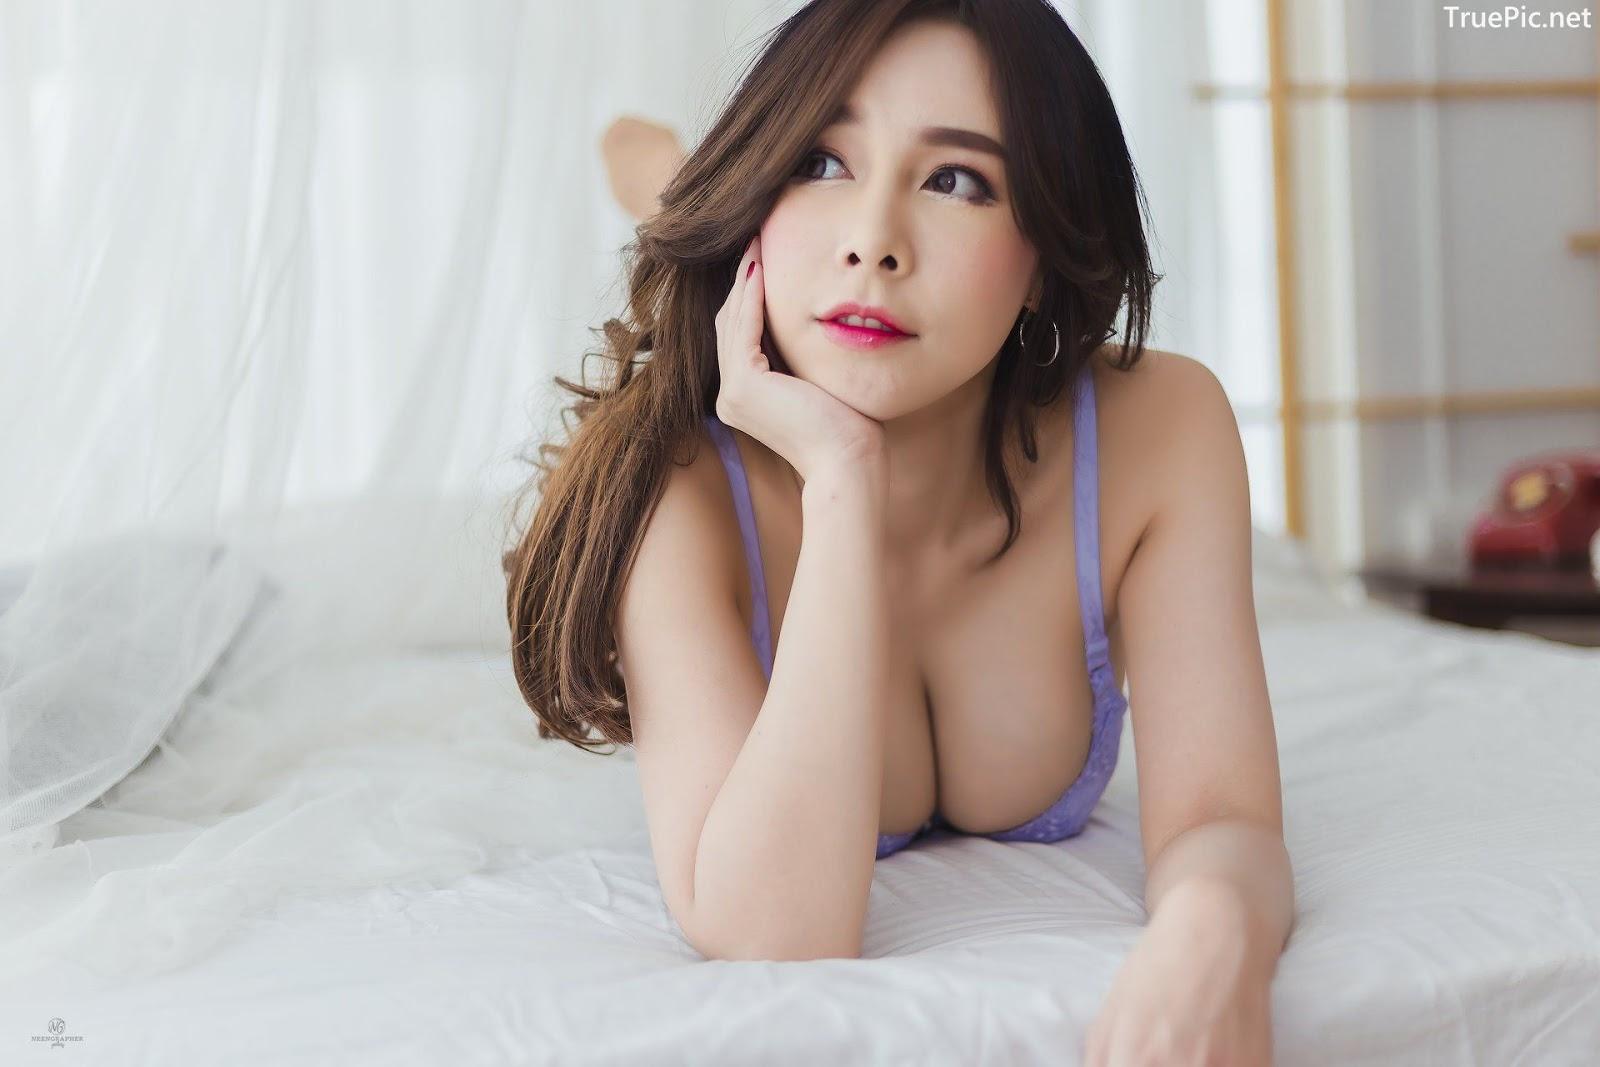 Image-Thailand-Hot-Model-Skykikijung-Purple-Lingerie-TruePic.net- Picture-2